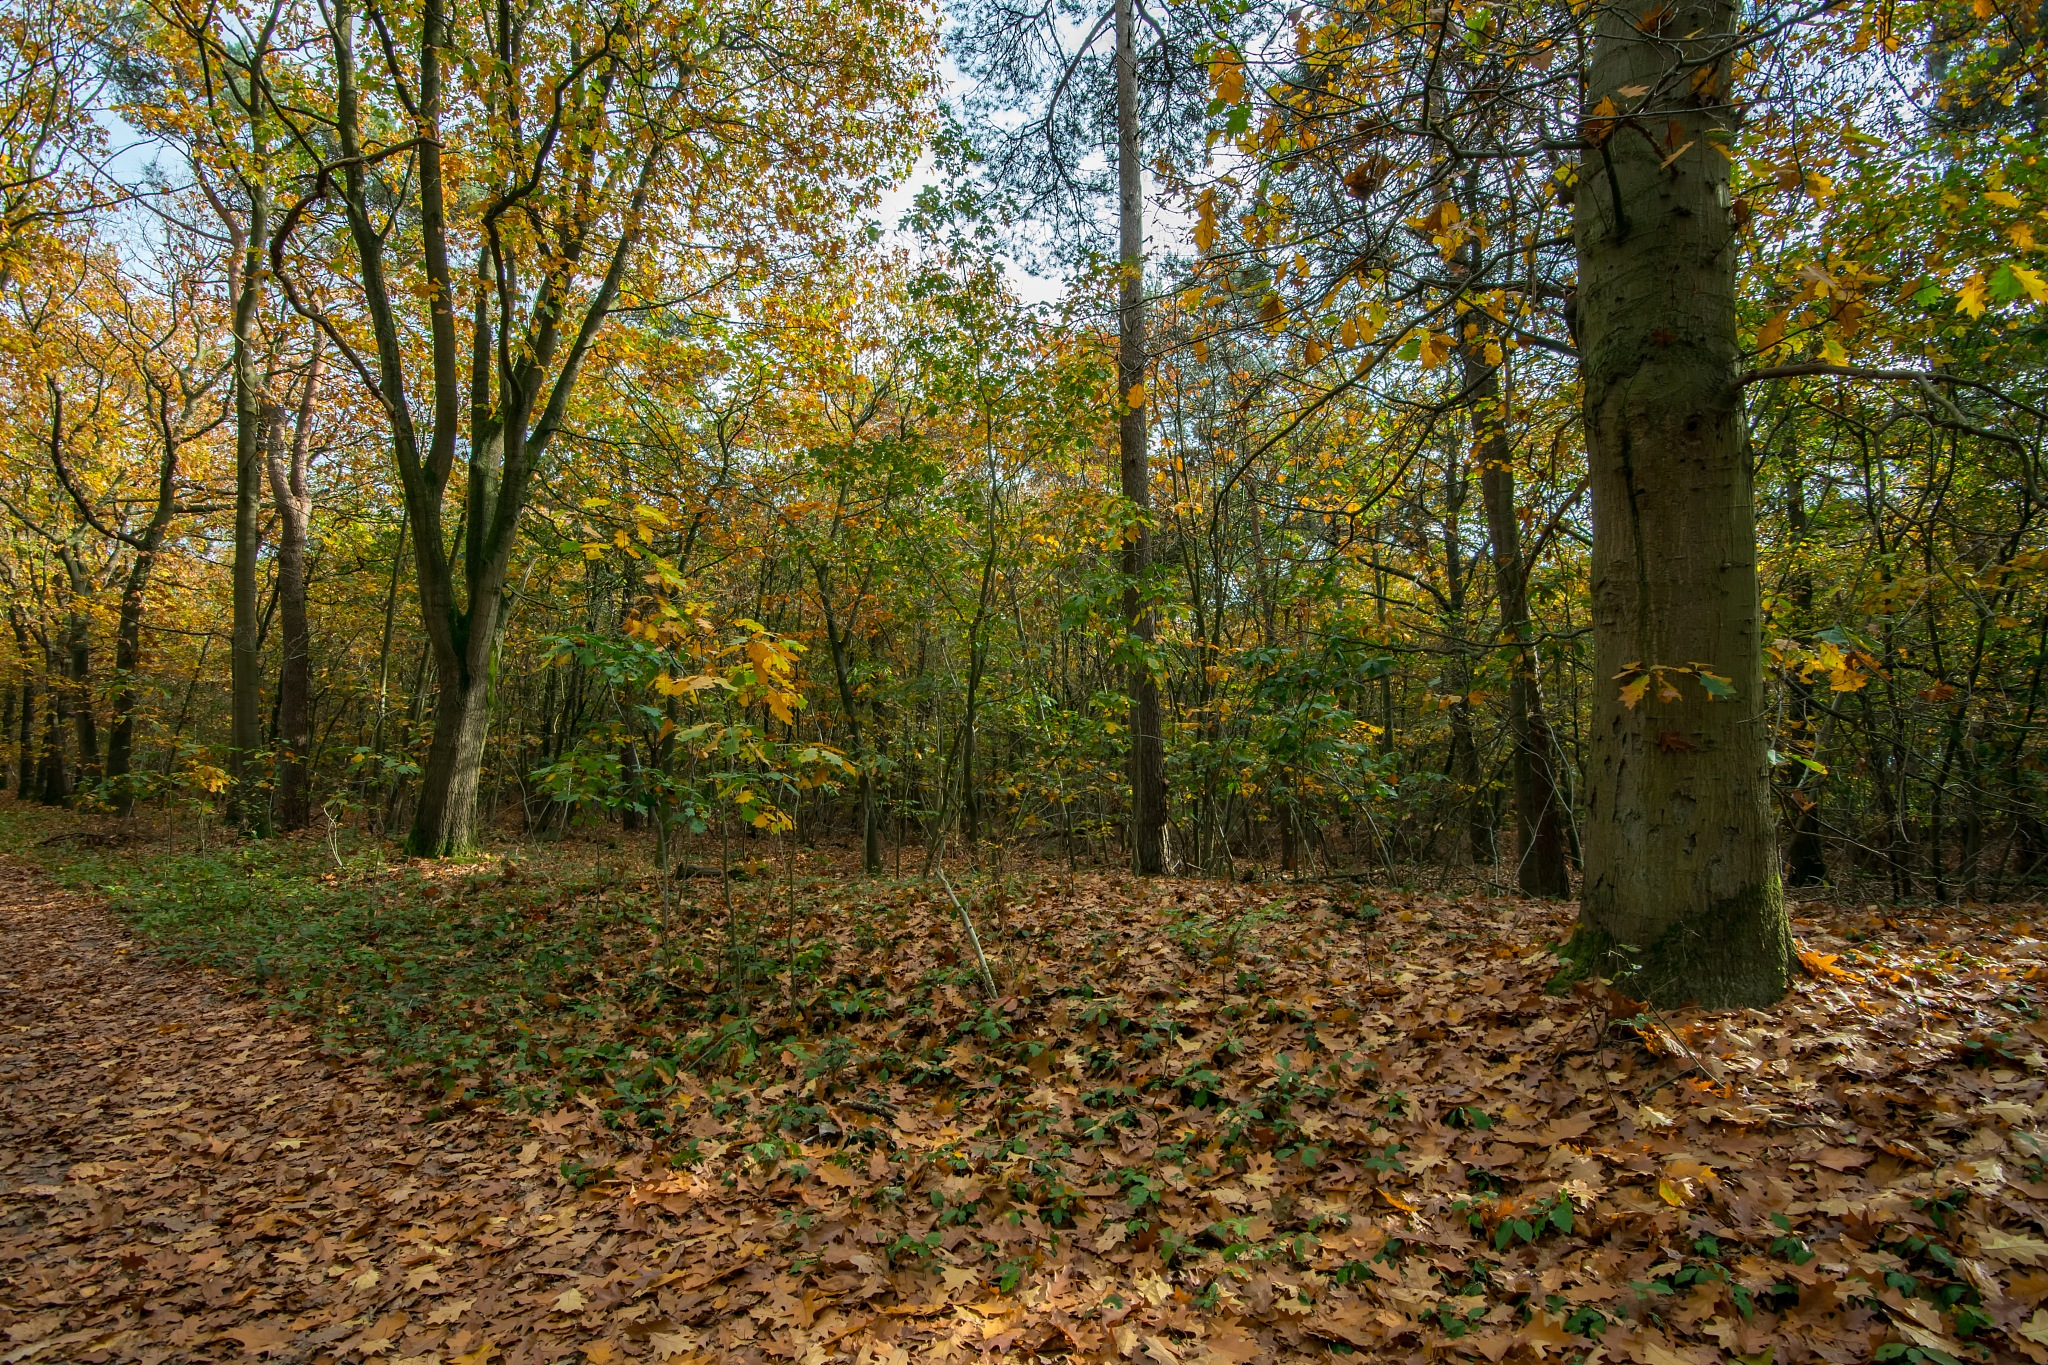 Autumn Colours_III by HaWaFoTo